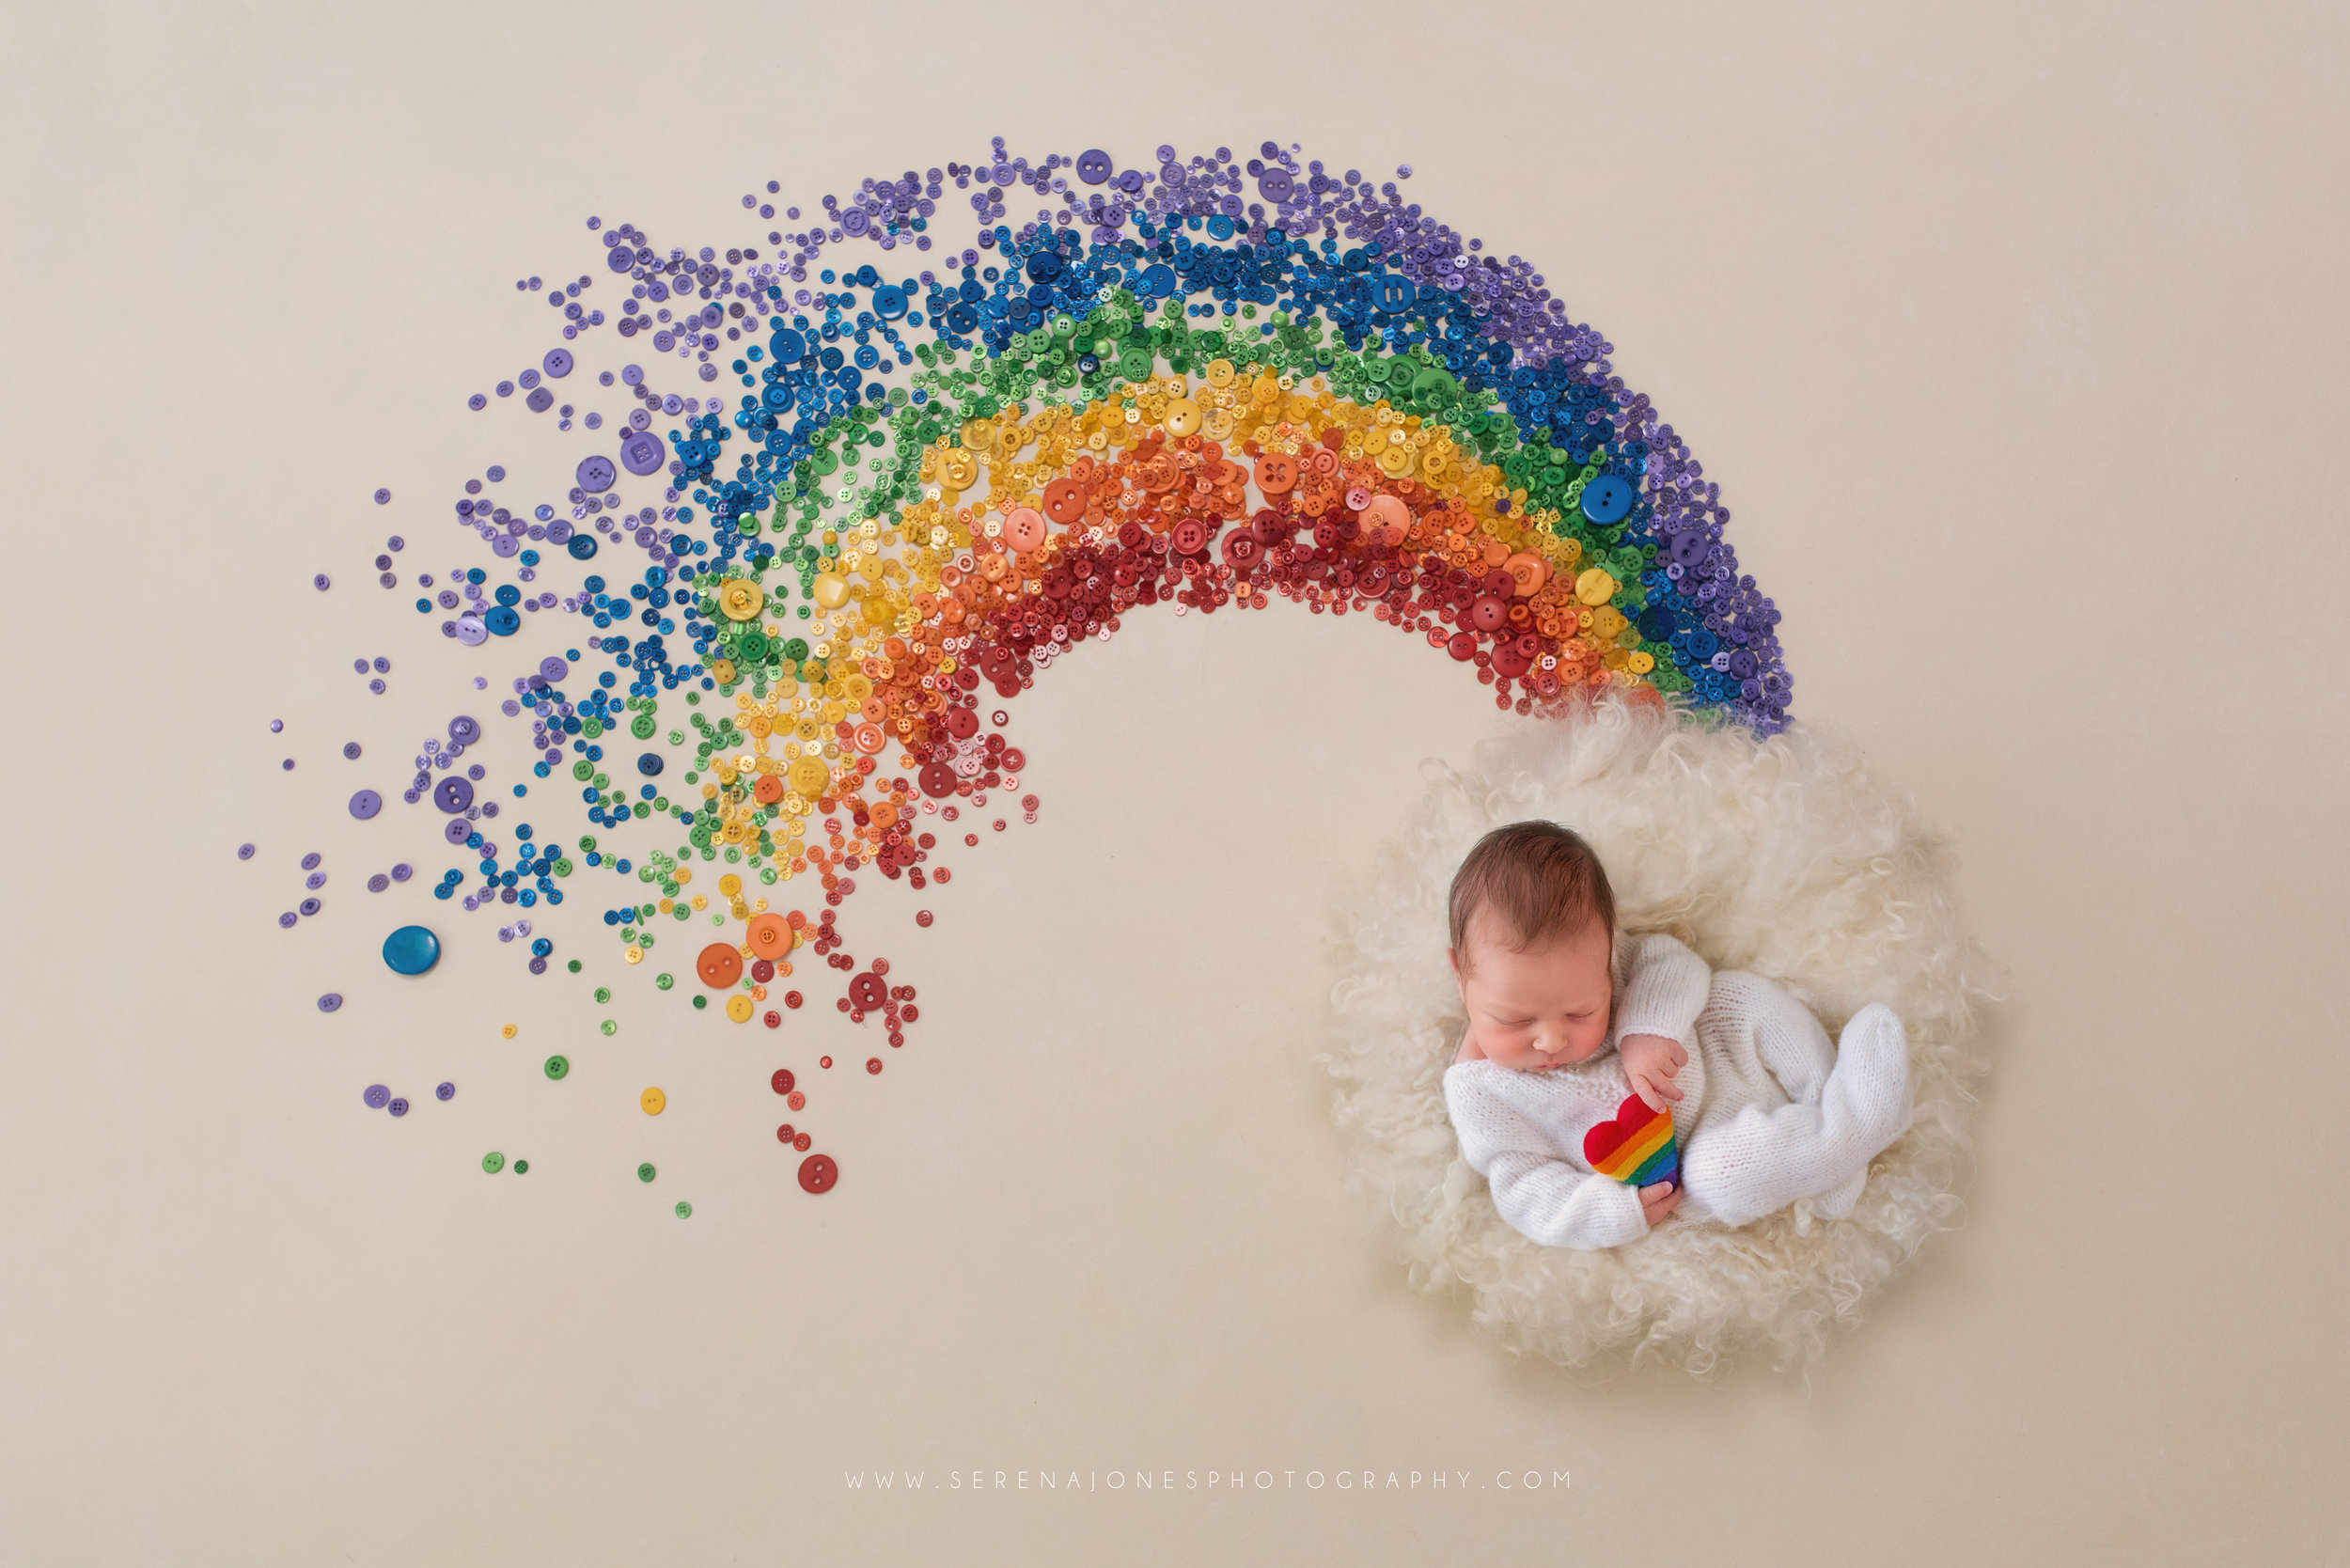 Serena Jones Photography - Jaxon William Emery  - 15 FB.jpg